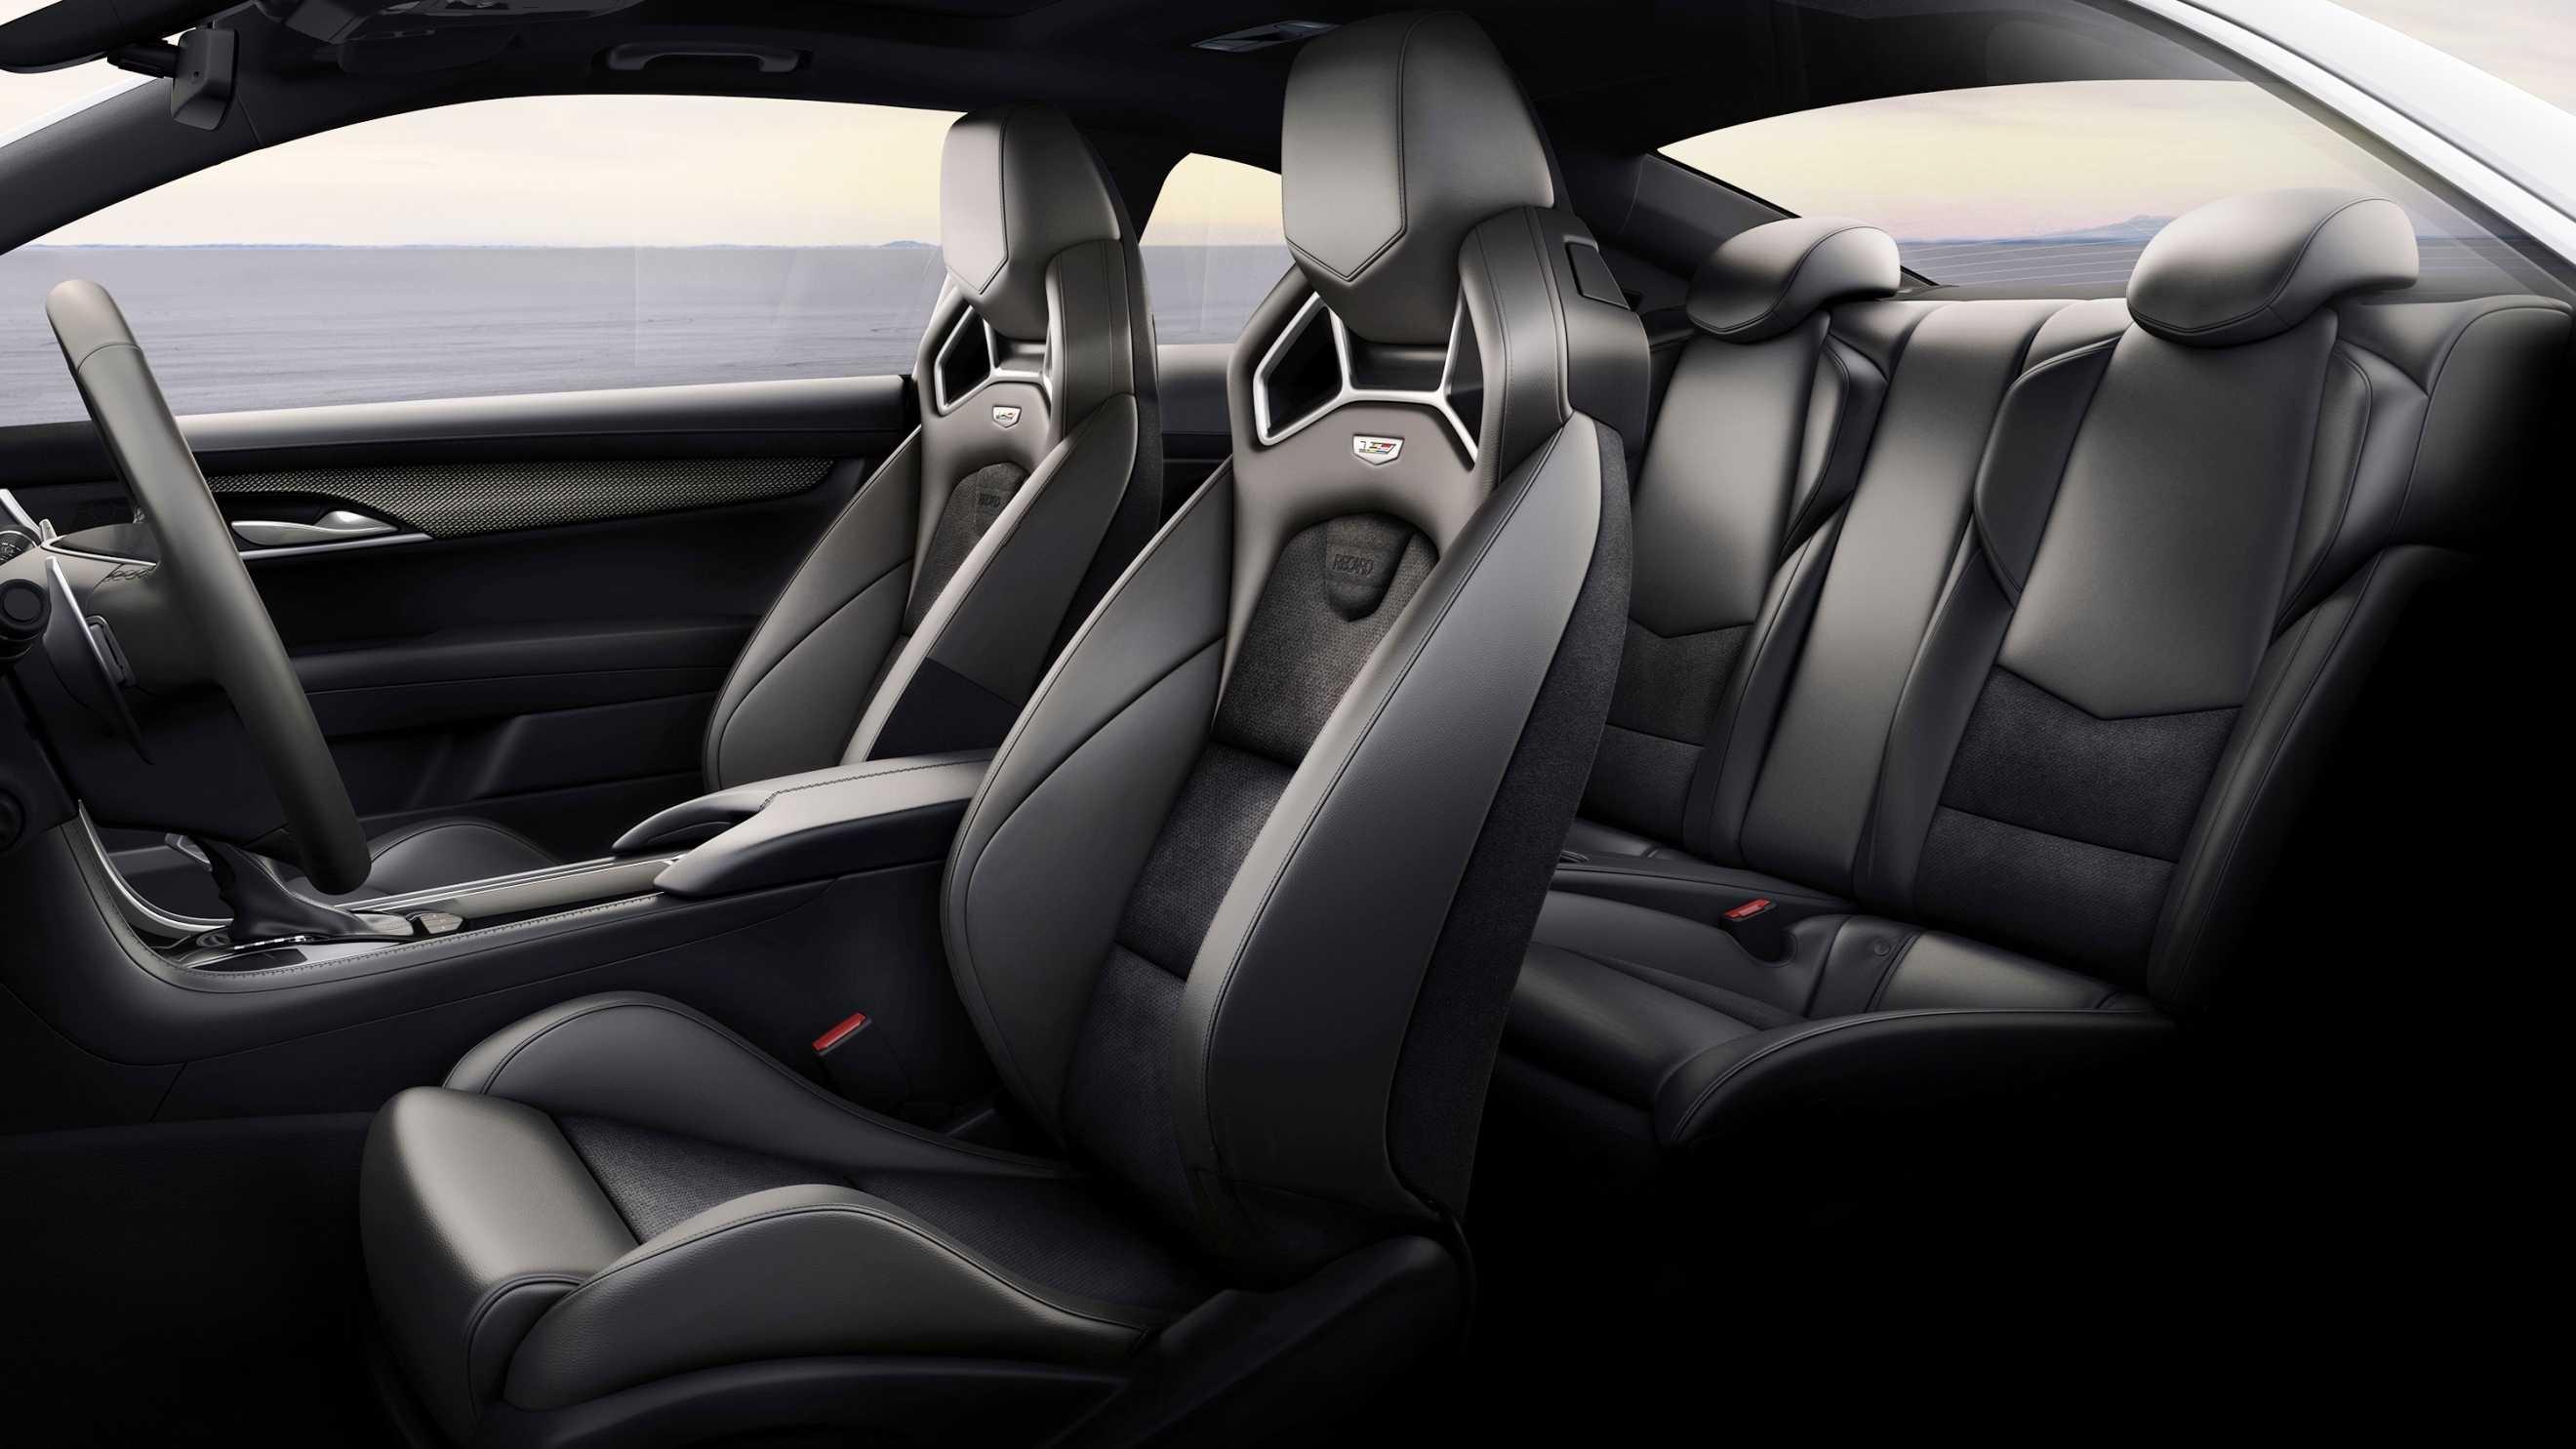 455hp 2016 Cadillac Ats V Coupe And Sedan Are Twin Turbo Elsd